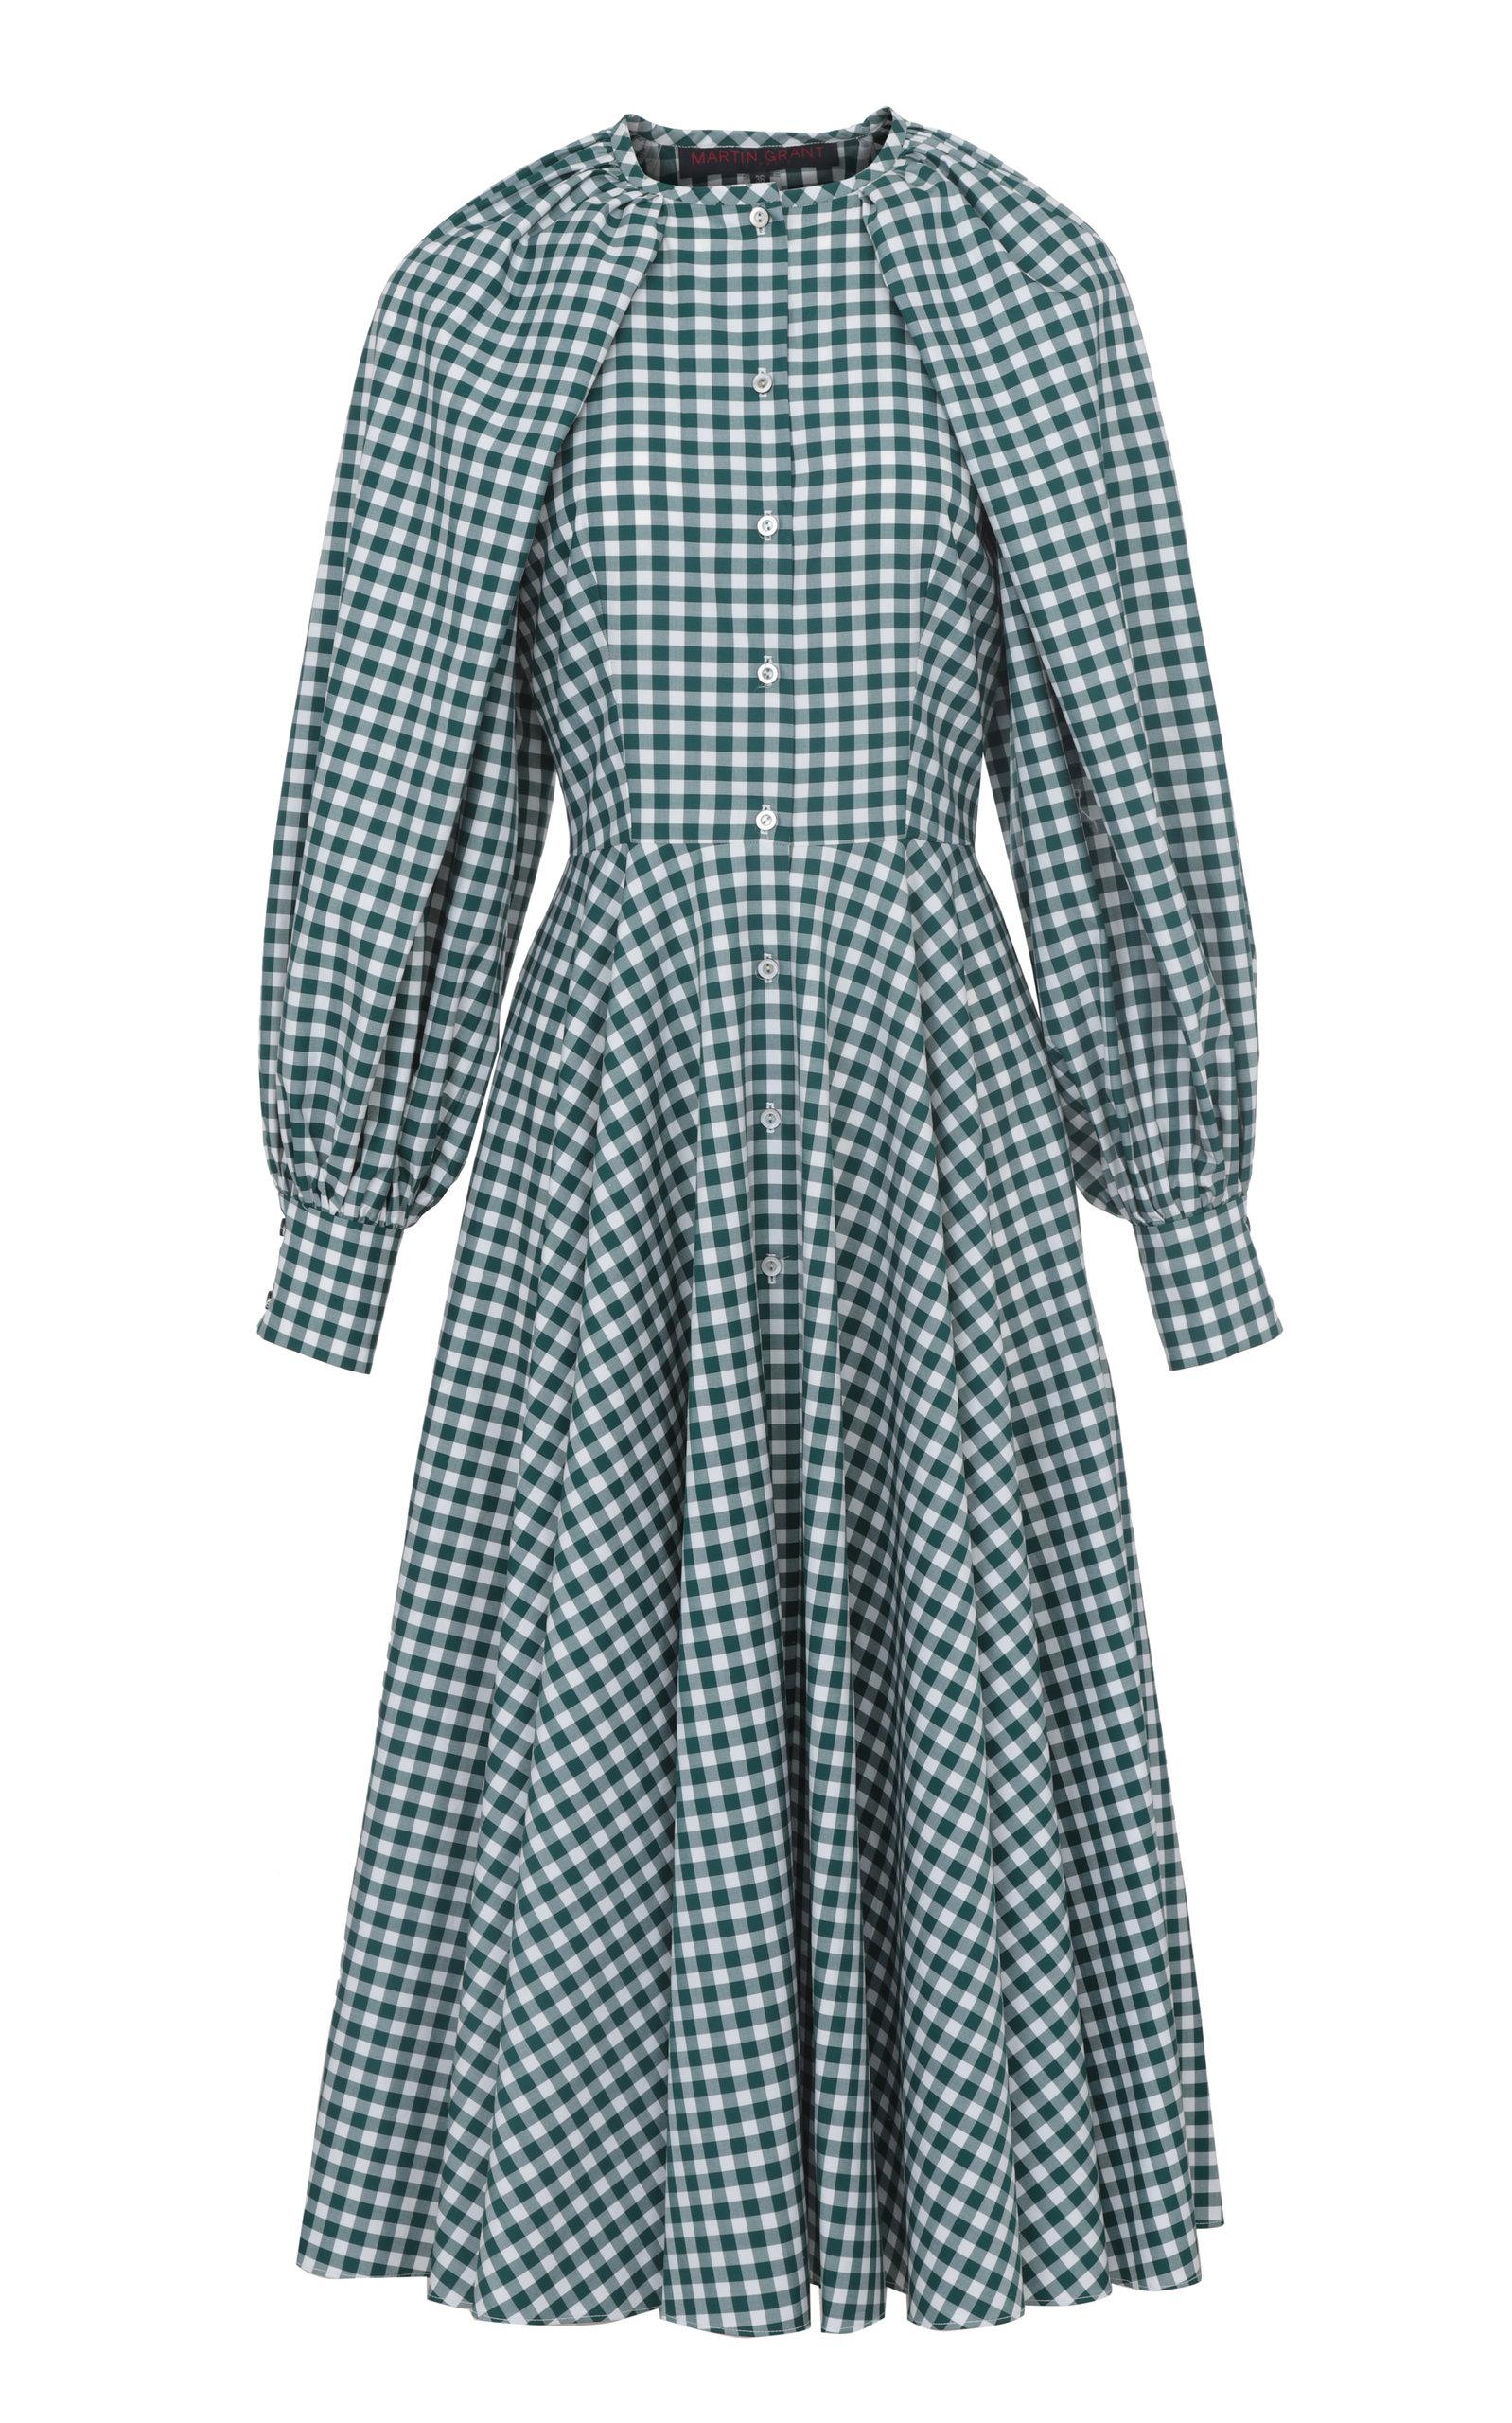 Women's Balloon-Sleeve Gingham-Checked Cotton Midi Dress